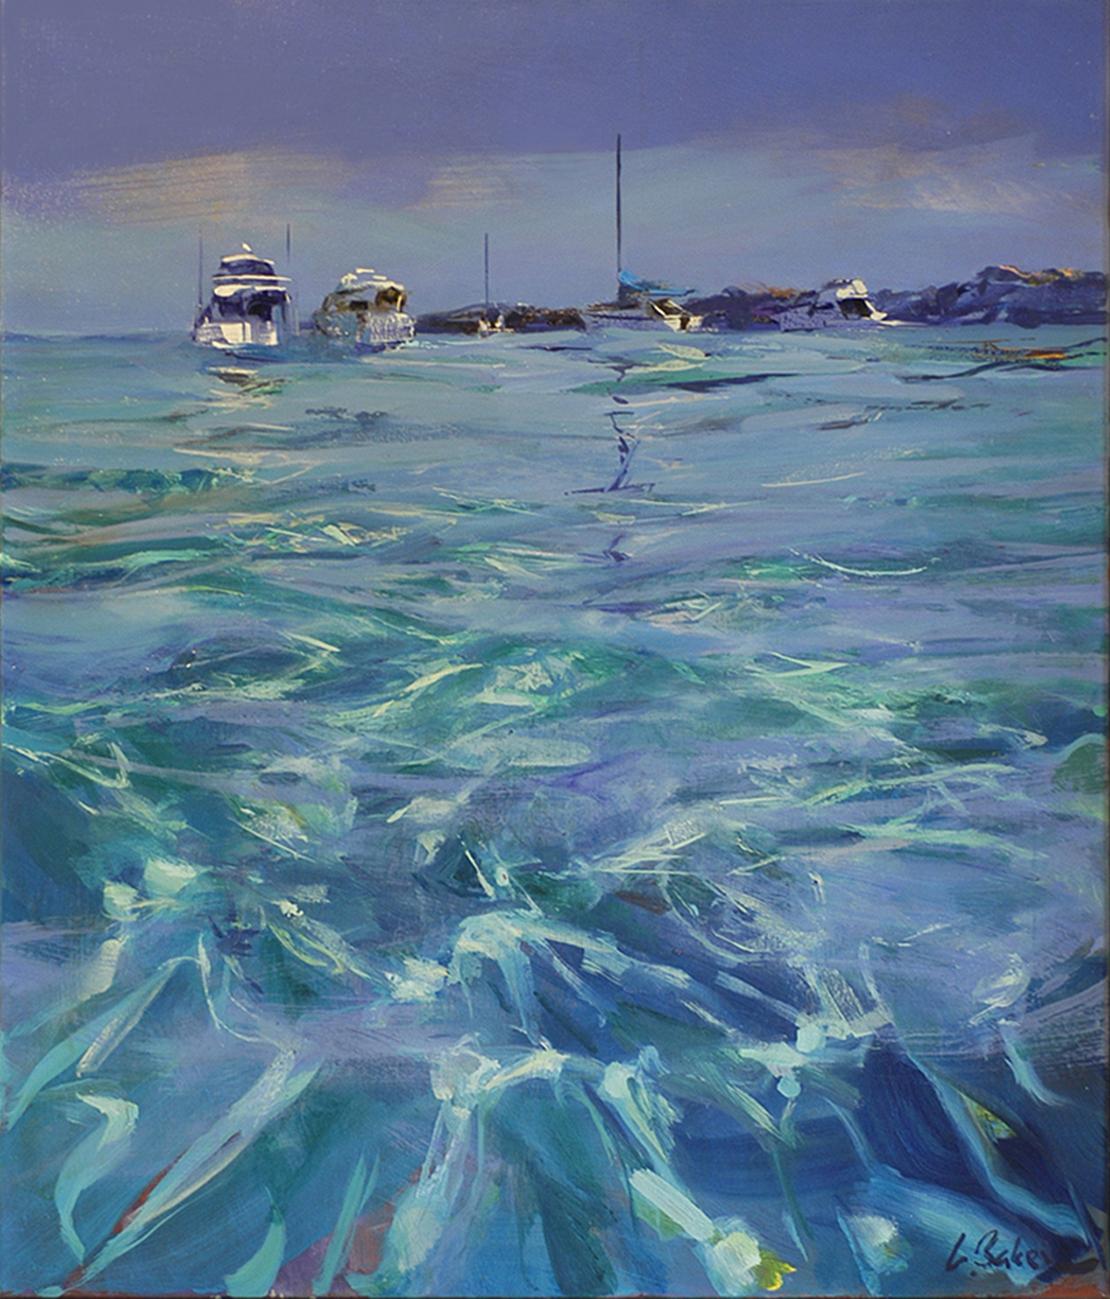 Flotilla, Parker Point - oil on canvas - 70 x 59cm - SOLD